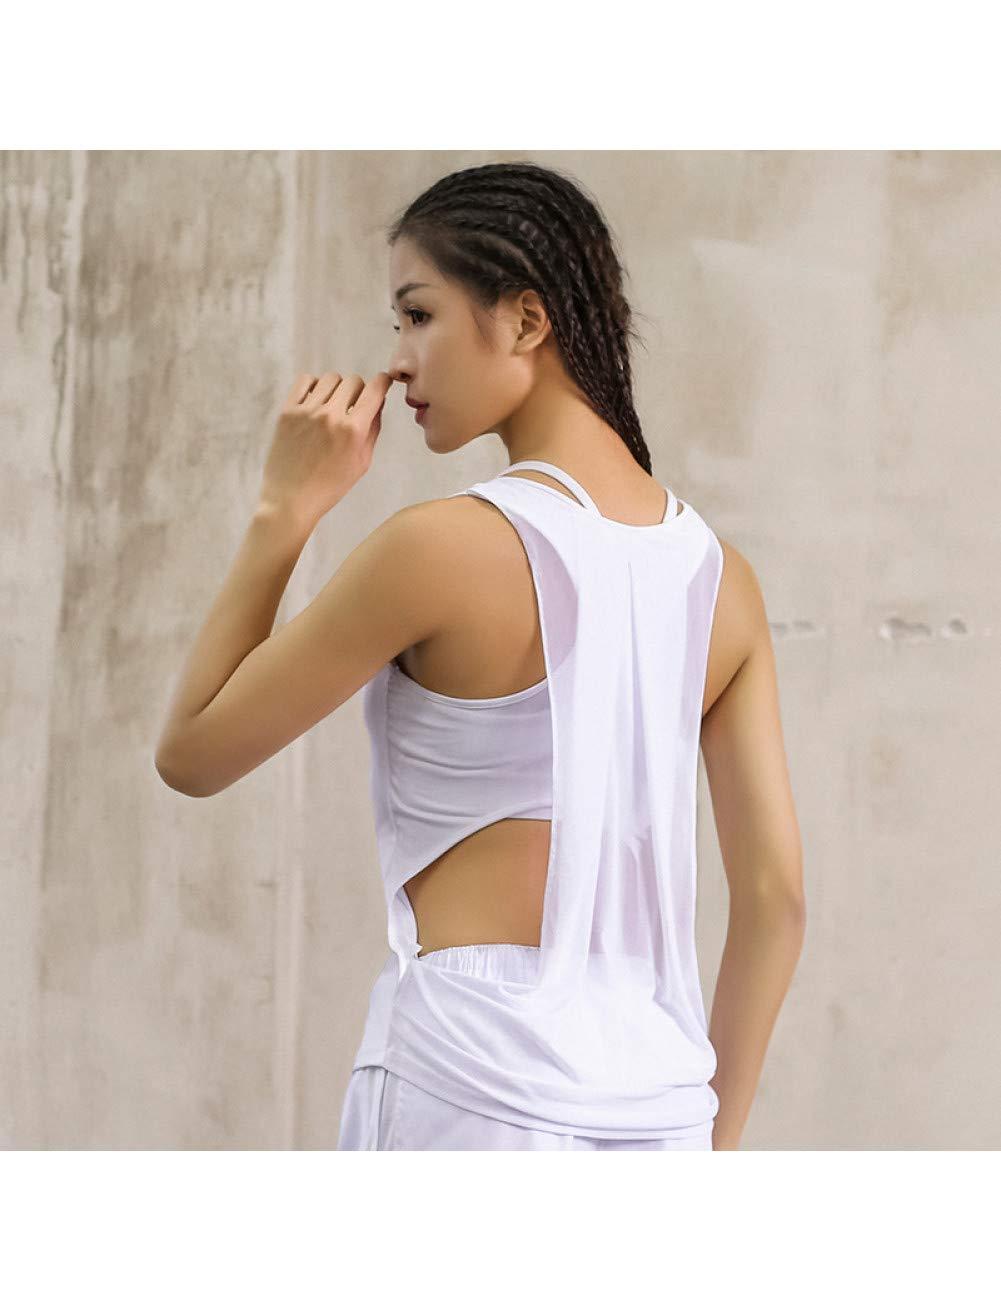 XCWYZ Sport BH Frauen Gym Sport T-Shirt Yoga Workout Weste Fitness Training Übung Laufbekleidung Sportbekleidung T Tops Kleidung